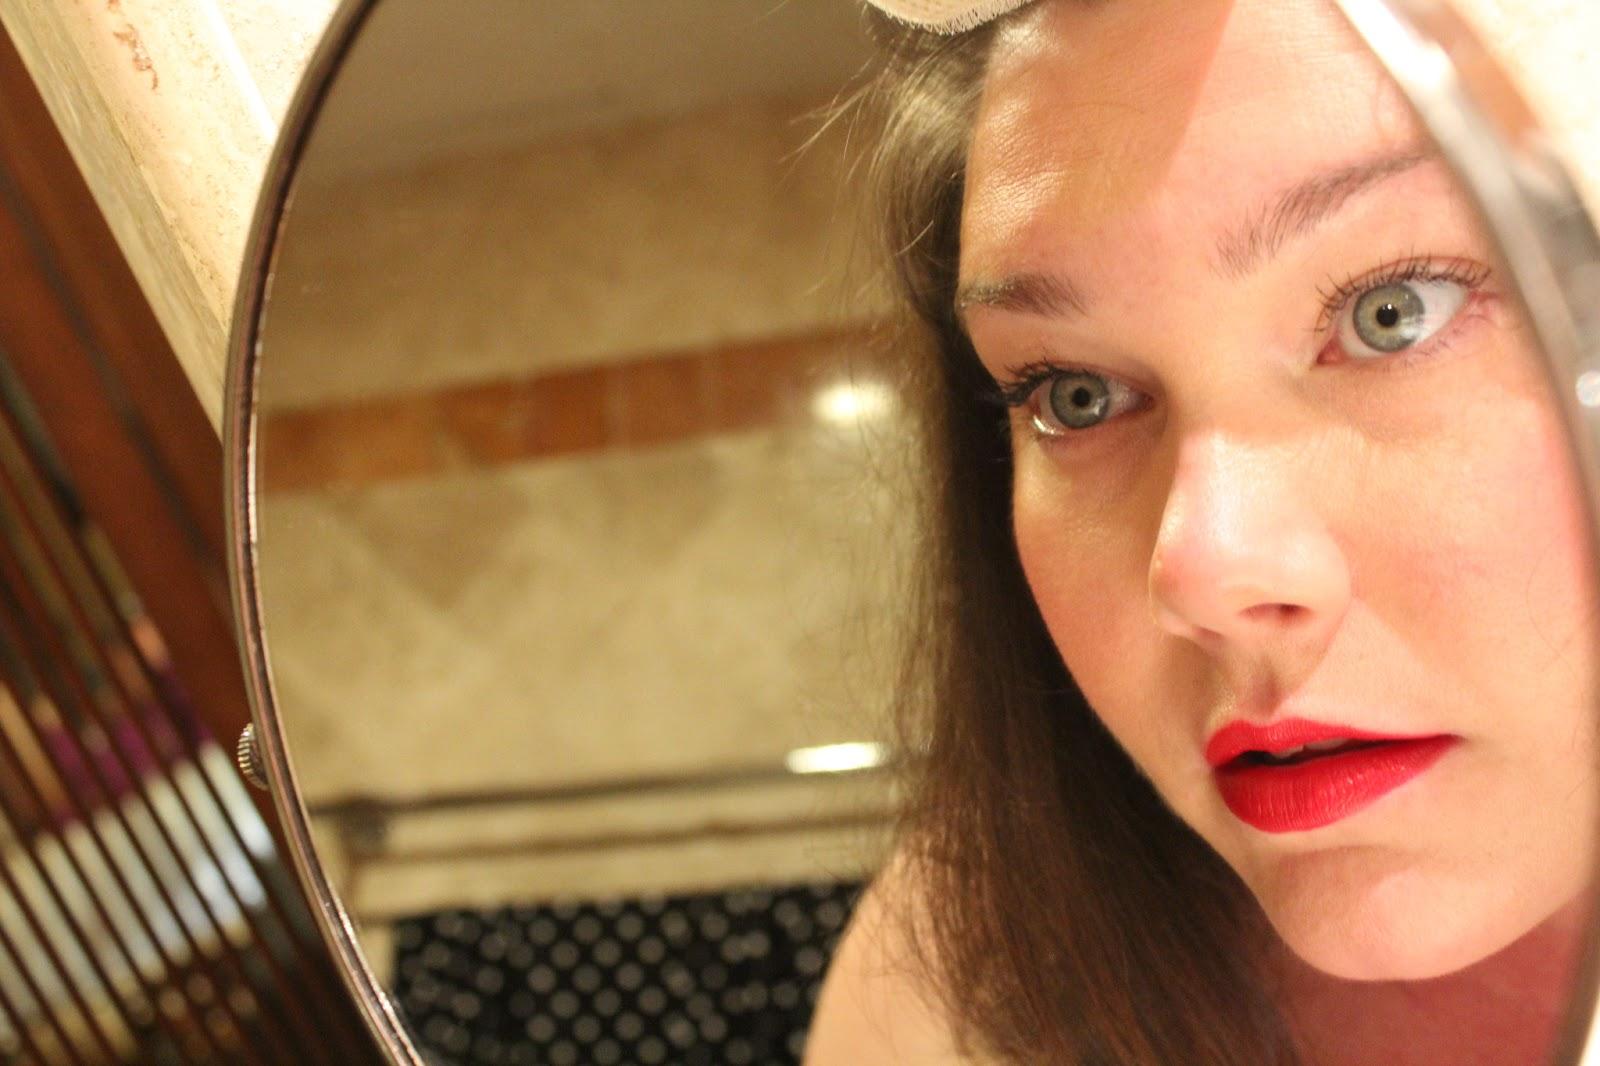 Beauty Product Review: Eye Majic easy eye shadow applicators